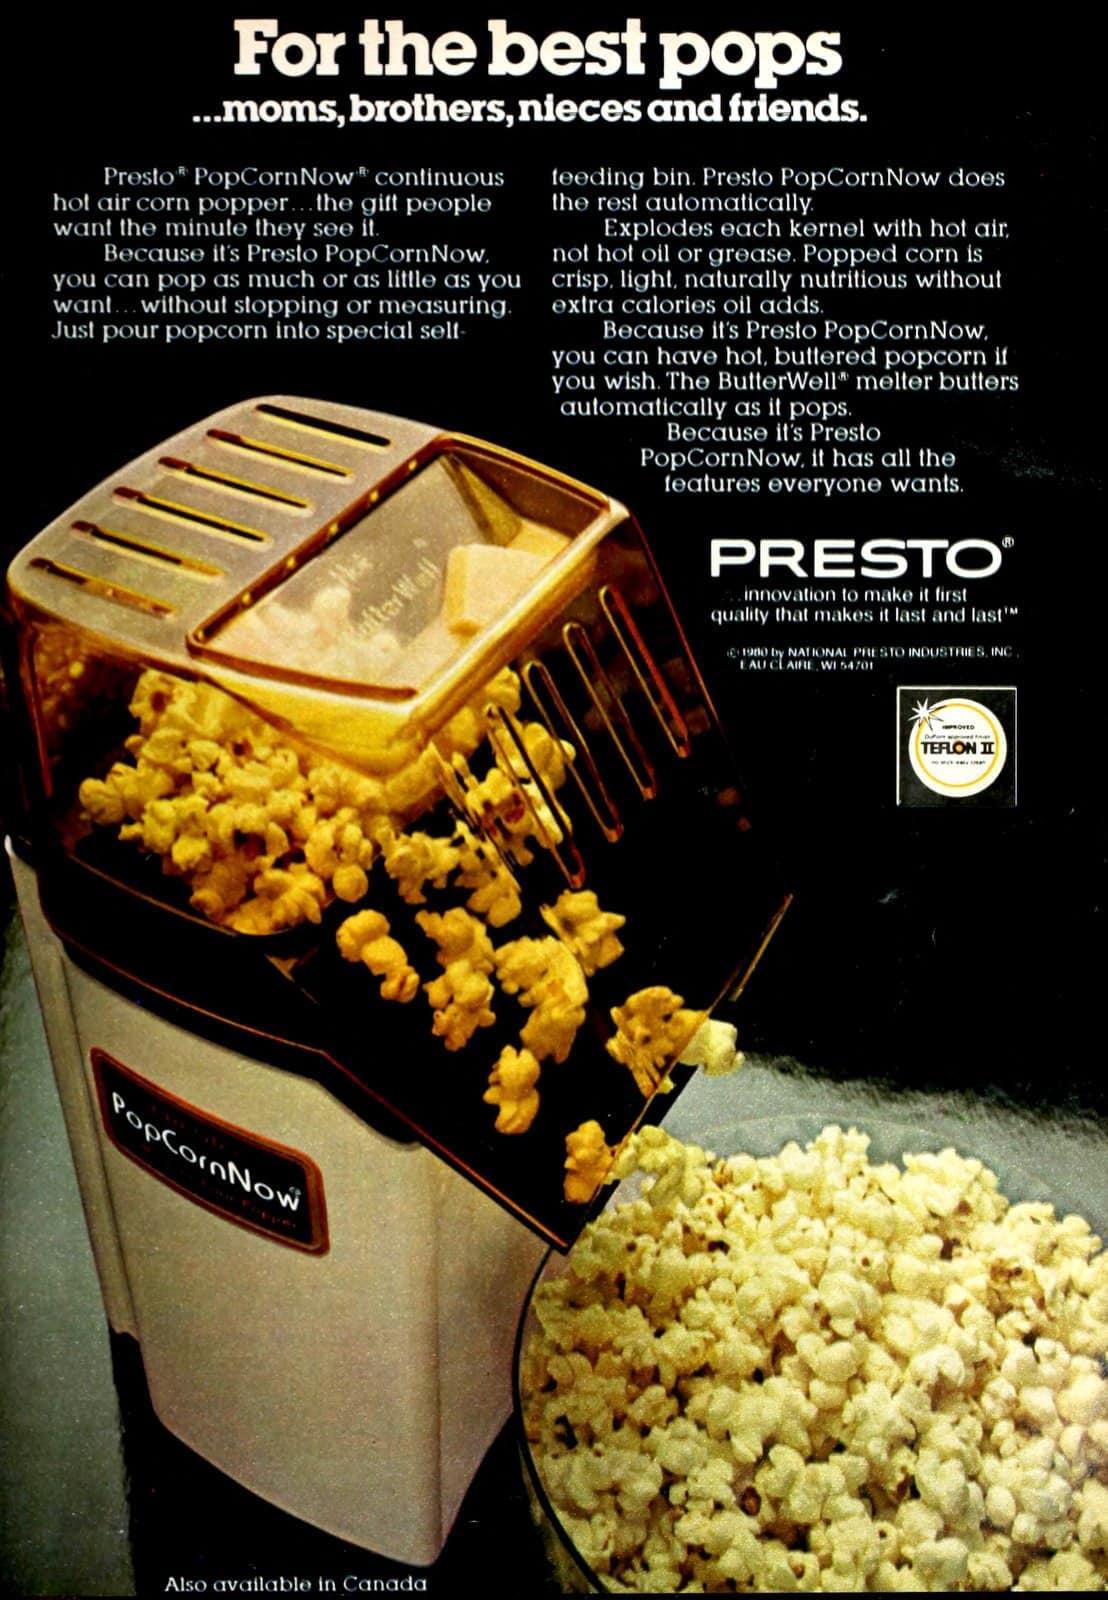 Presto PopCornNow -- retro popcorn maker (1980)